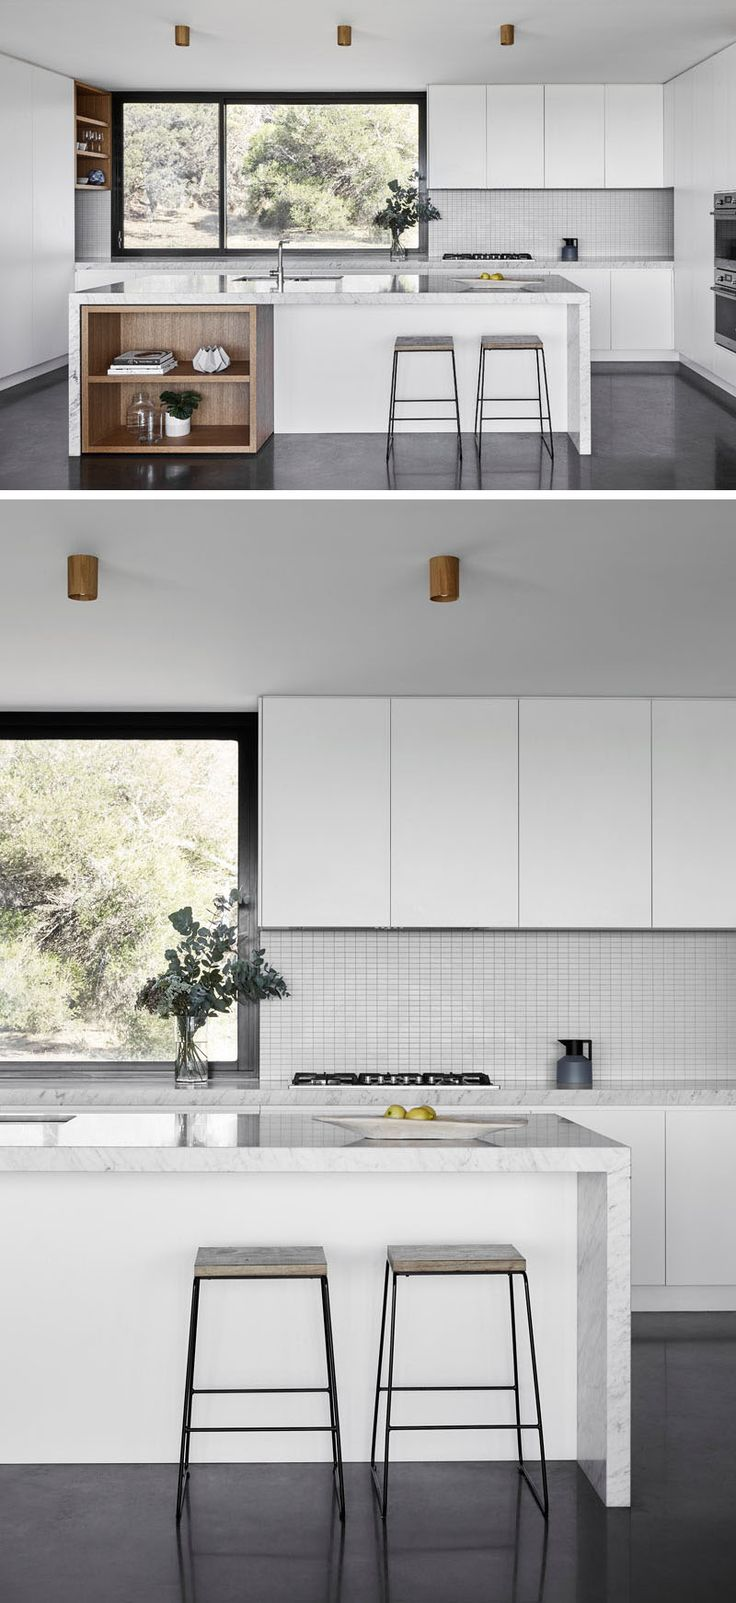 619 best kitchen & wine images on Pinterest | Interiors, Kitchens ...